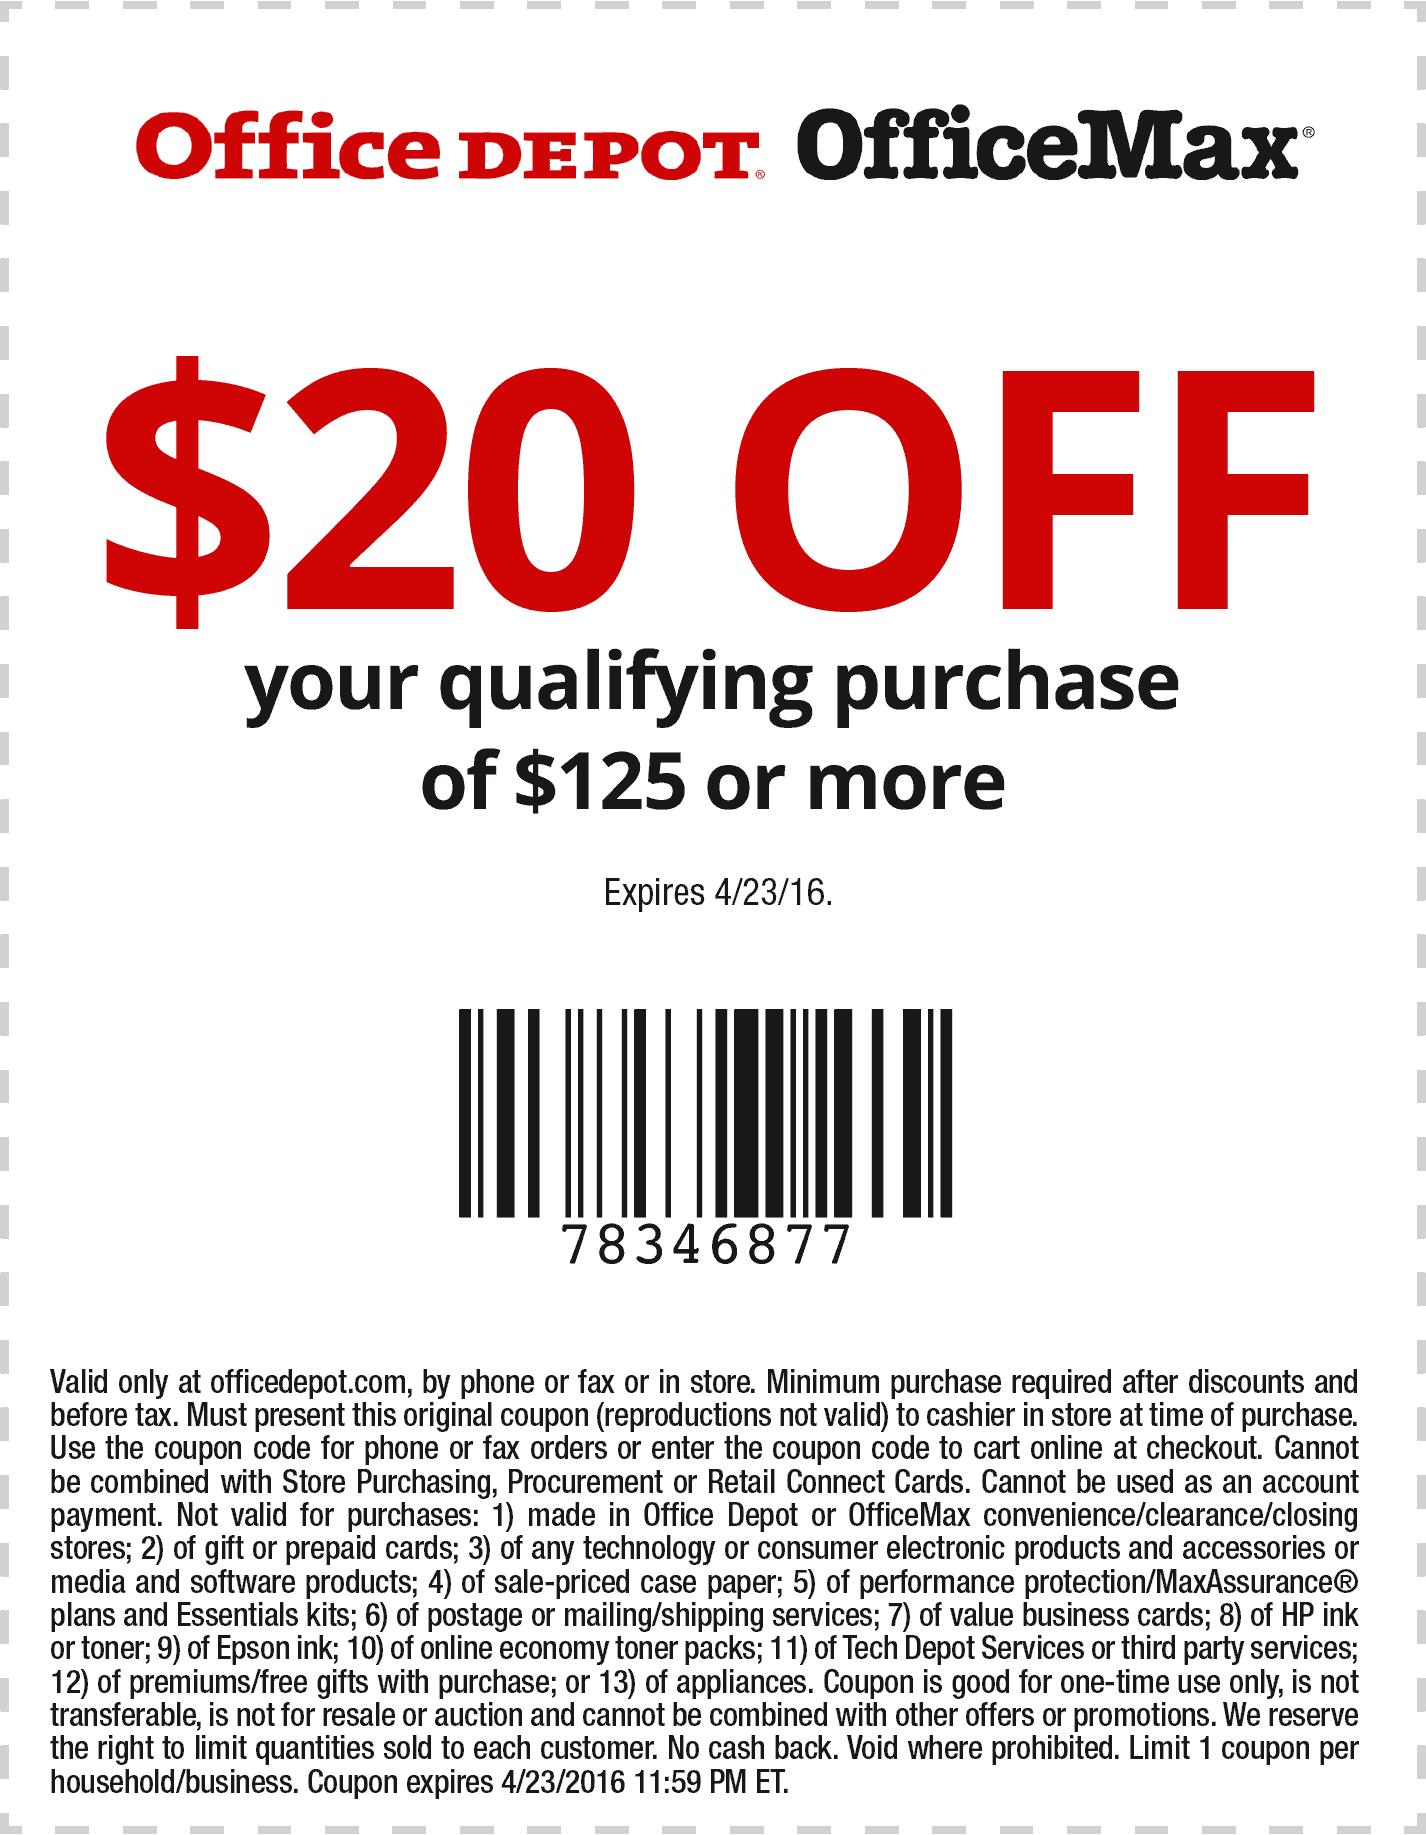 Via coupon code